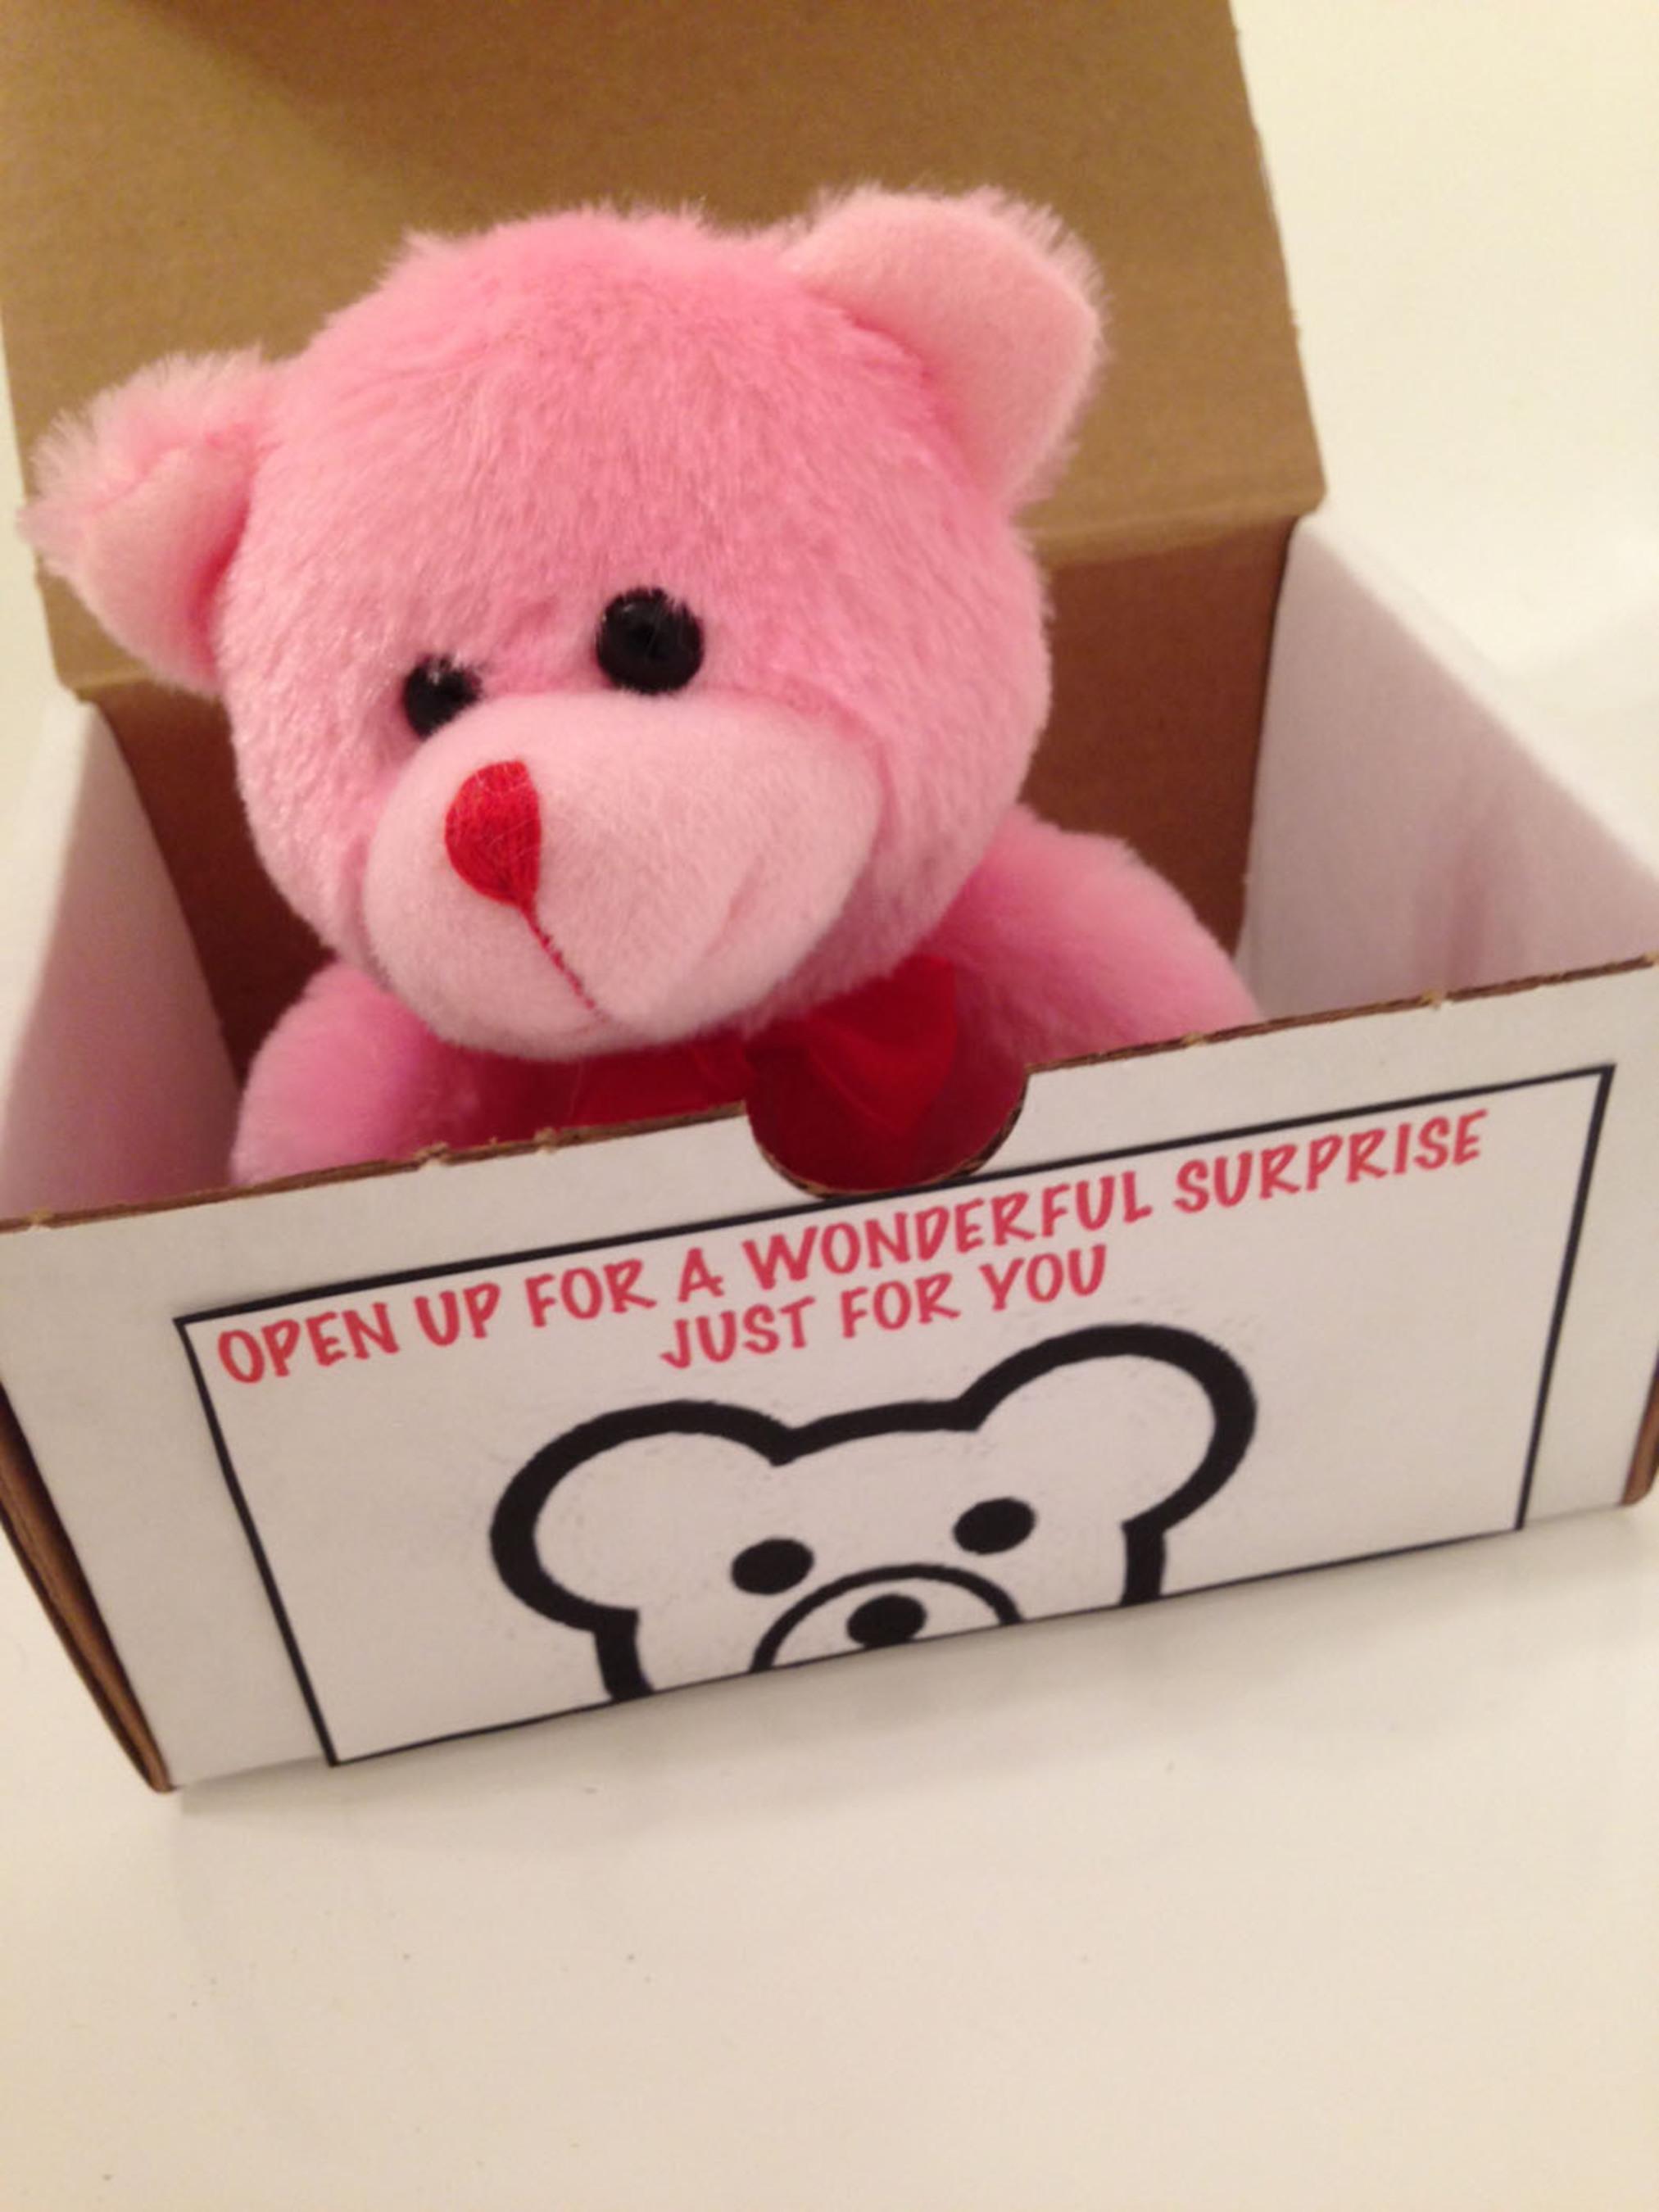 Send a surprise gift to your loved one with Teddybearforfree.com. (PRNewsFoto/Teddybearforfree.com)